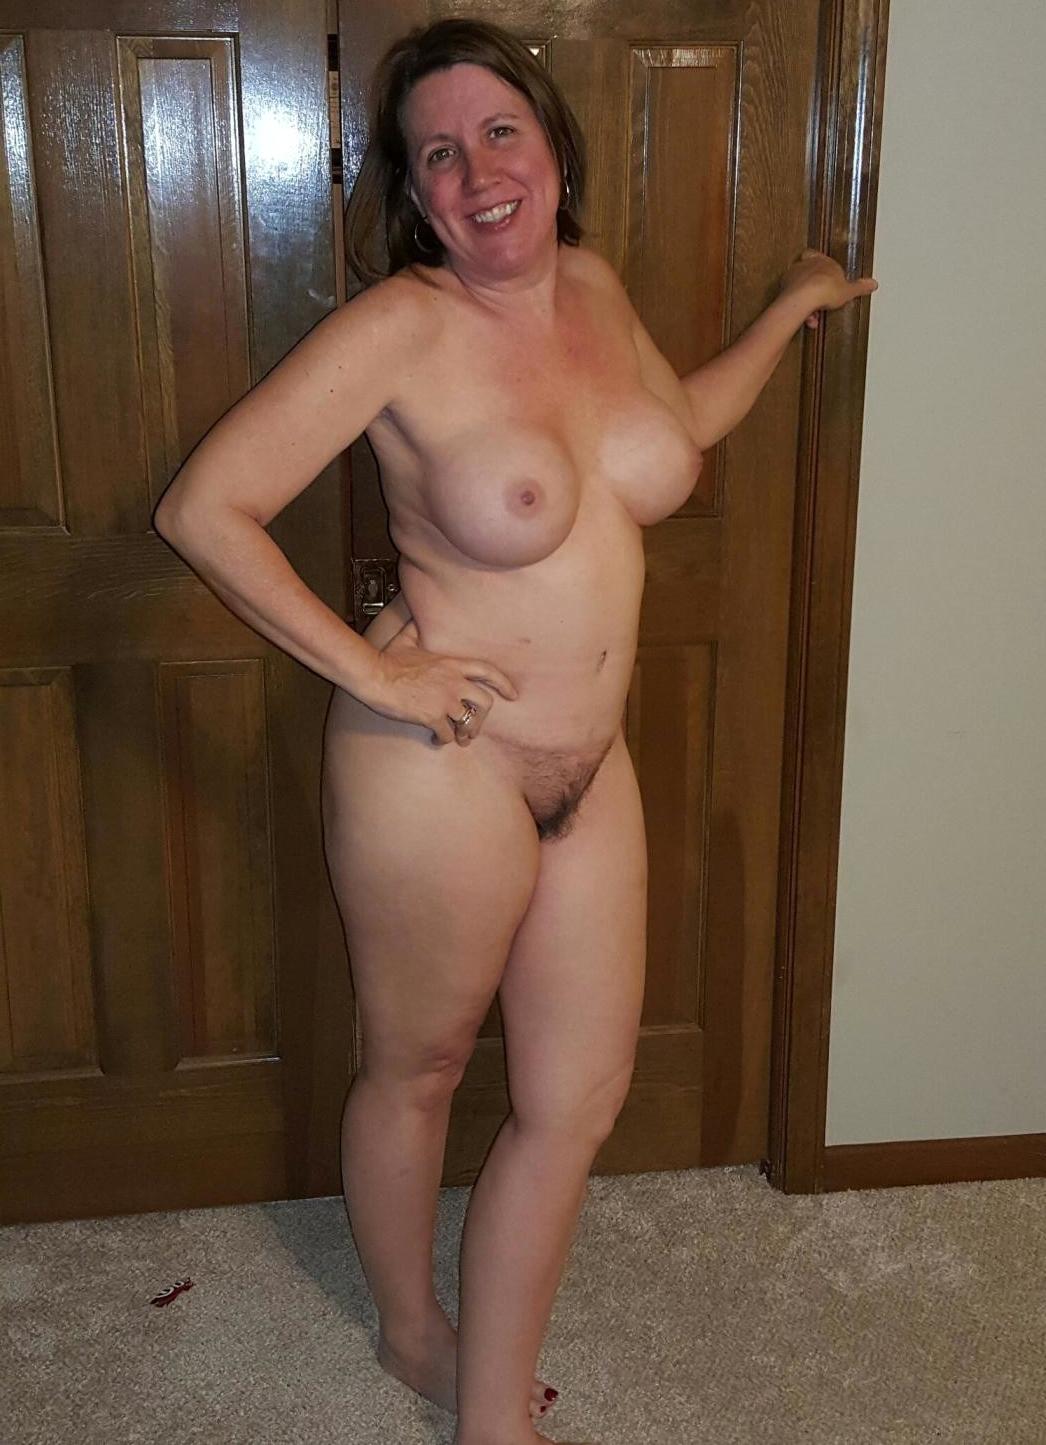 Clothed like man nude woman